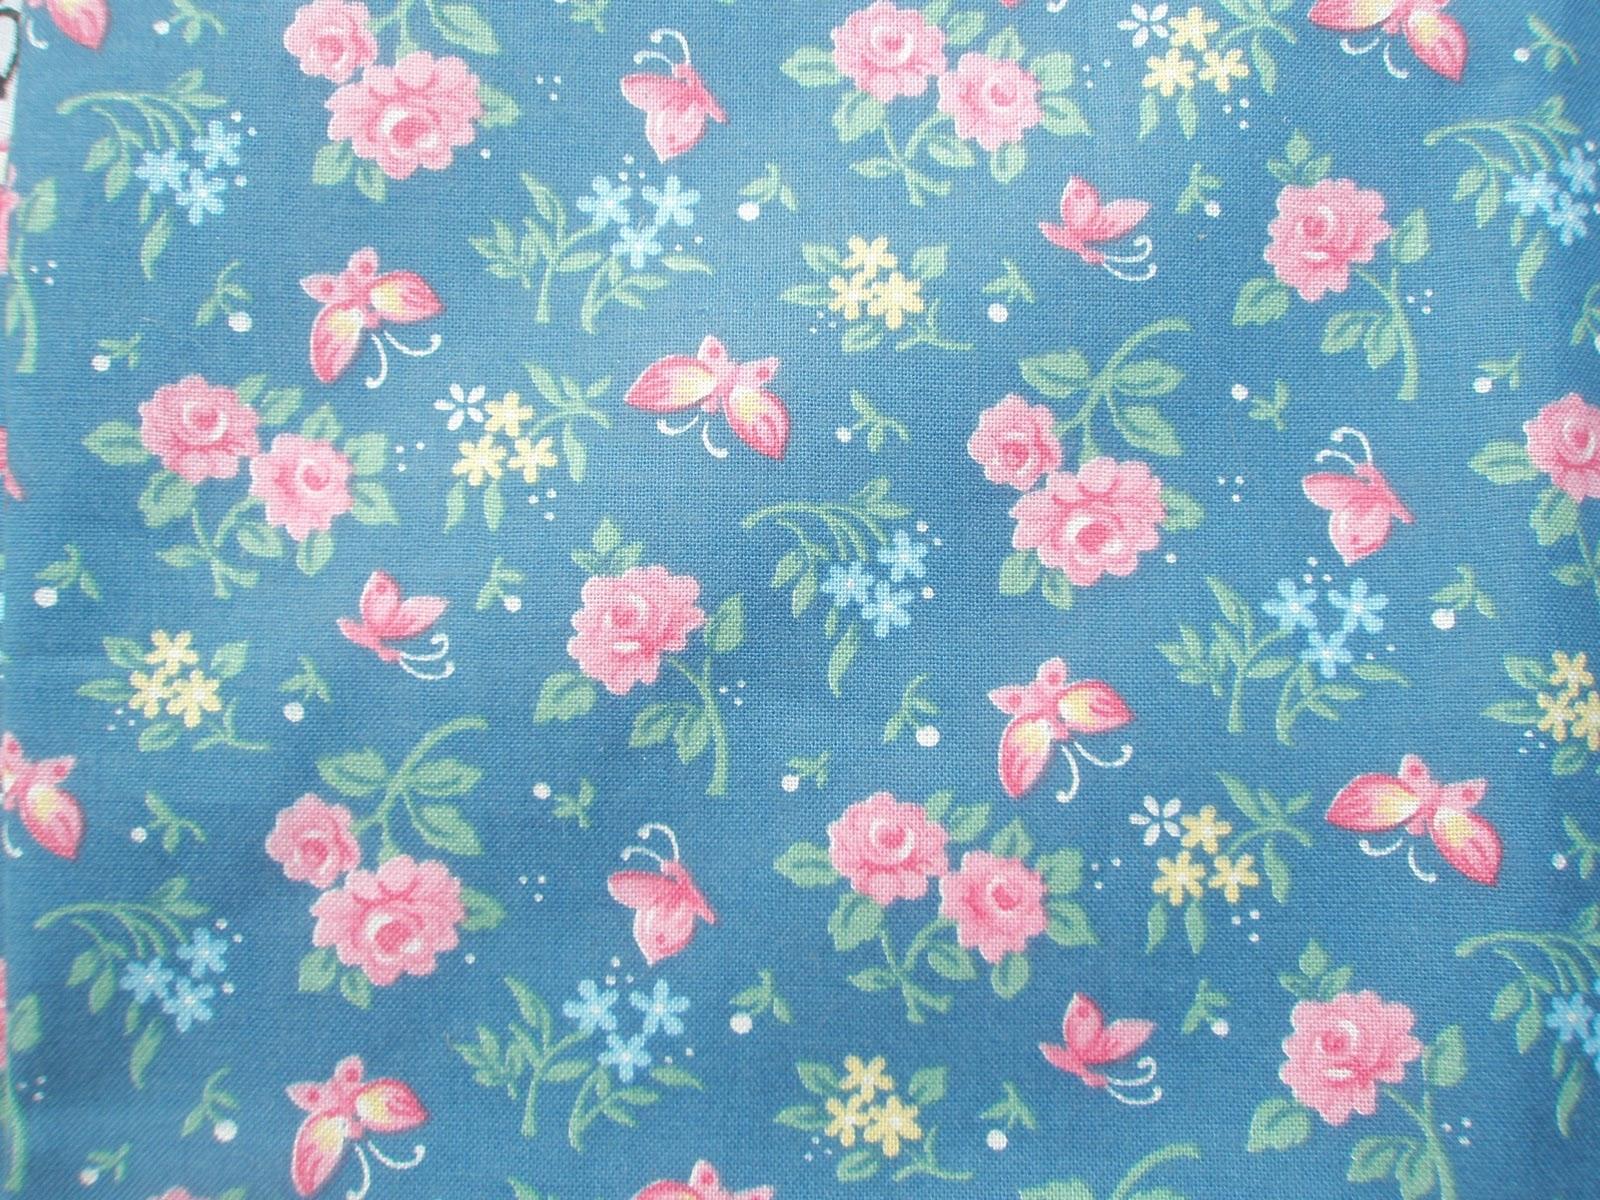 Free Download Flower Tumblr Backgrounds Ws0hfurn Blue